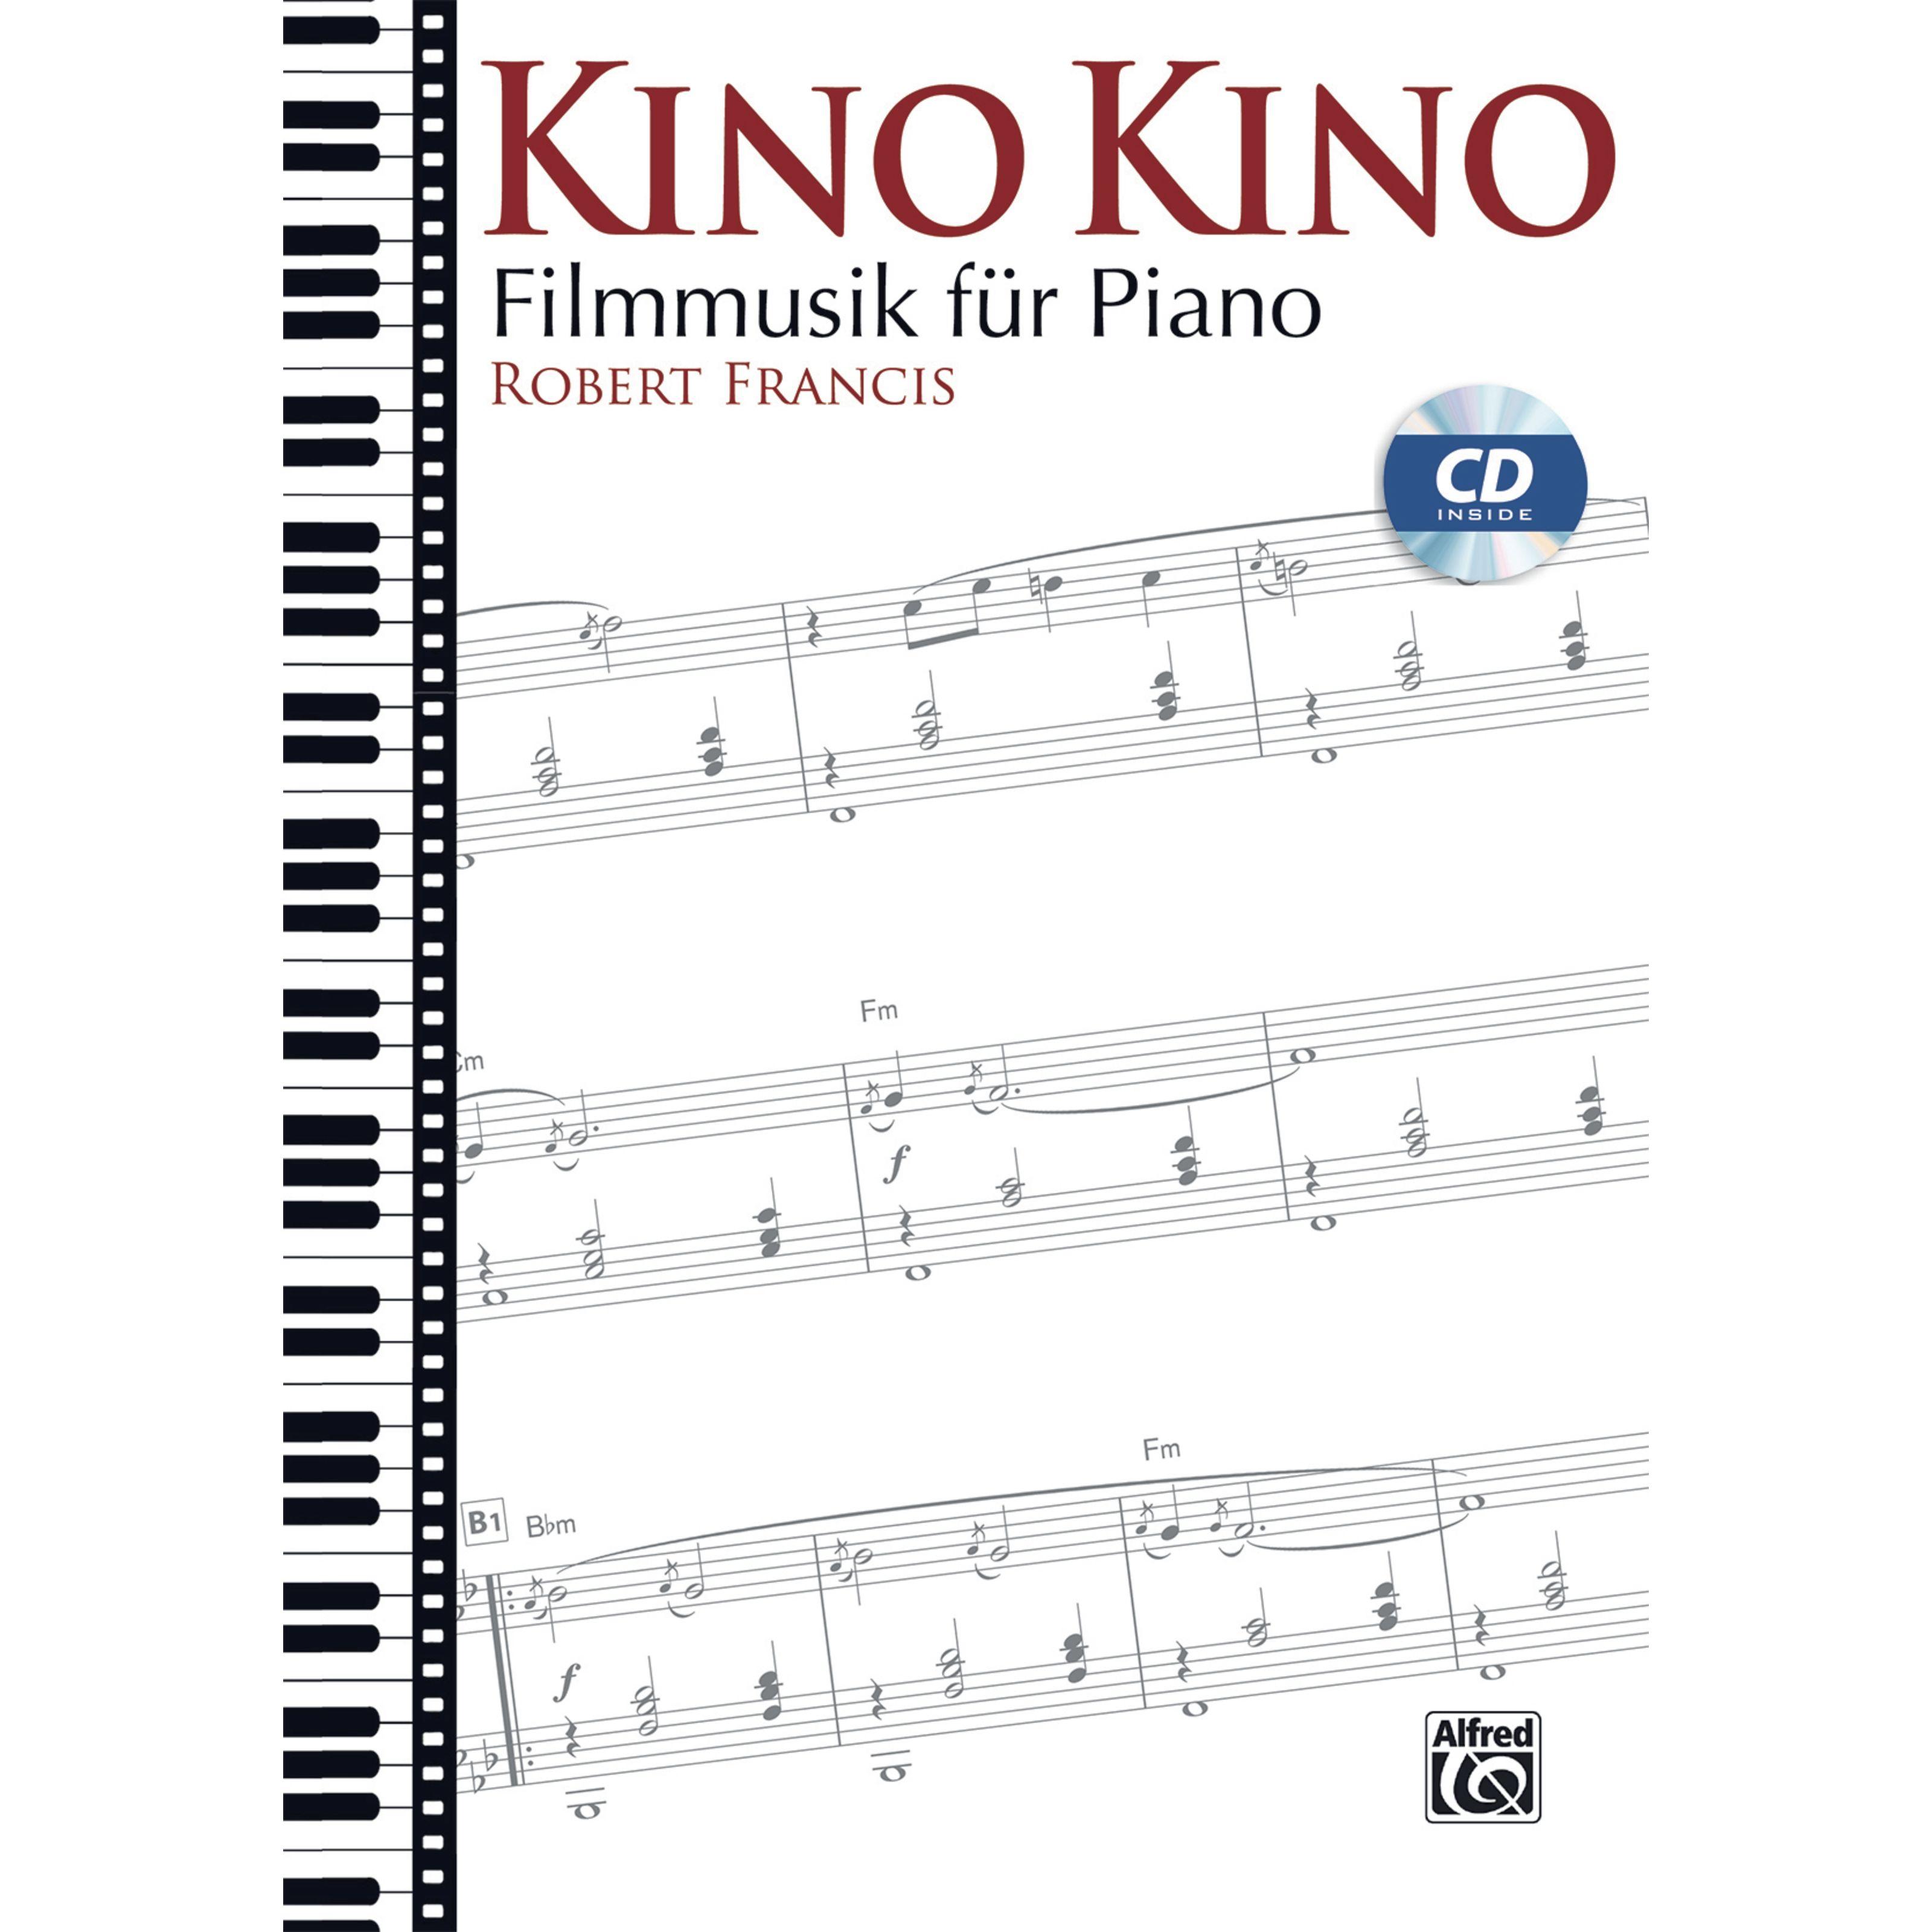 Alfred Music - Kino Kino: Filmmusik für Piano 00-20252G